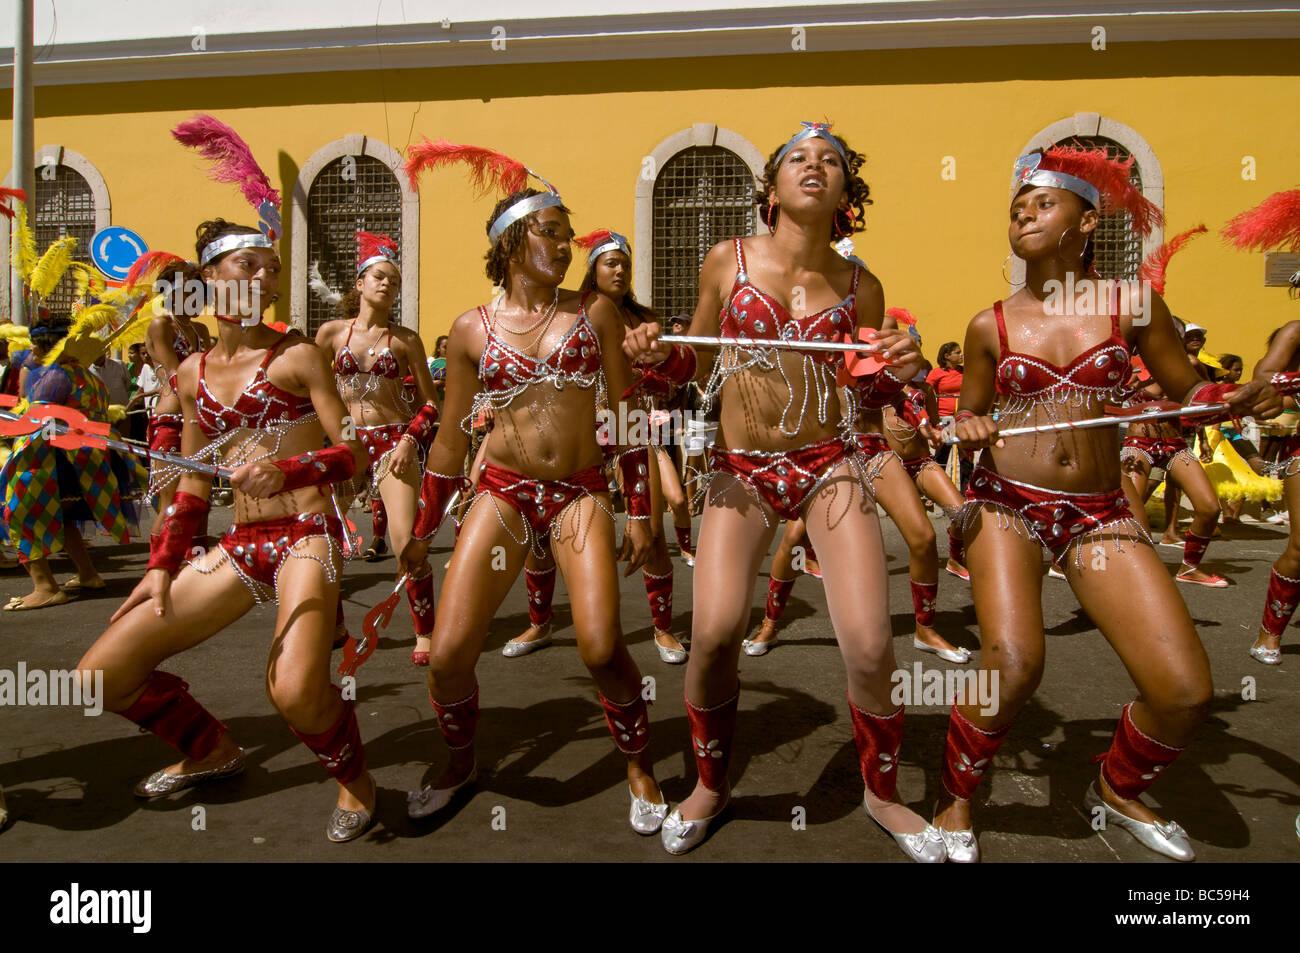 Bunt verkleidete hübsche Frauen tanzen Karneval Mindelo Kapverden Afrika - Stock Image